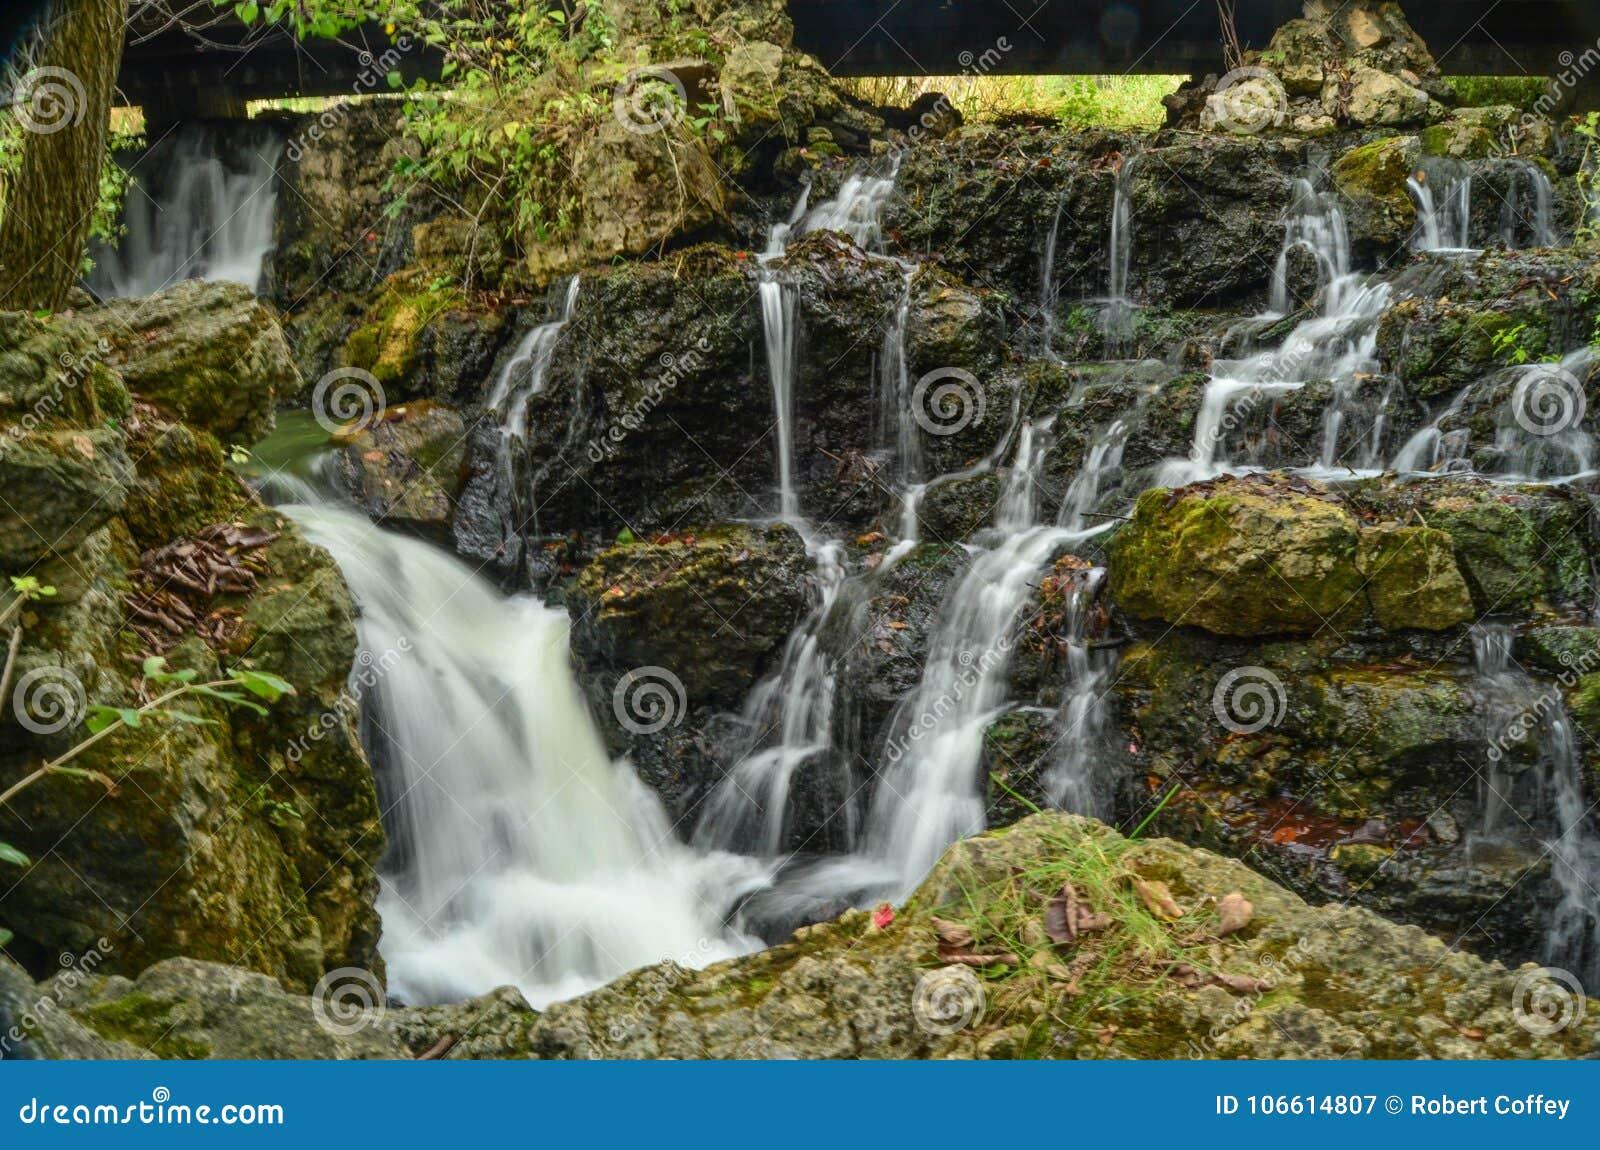 Cascading Water in a Rocky Stream